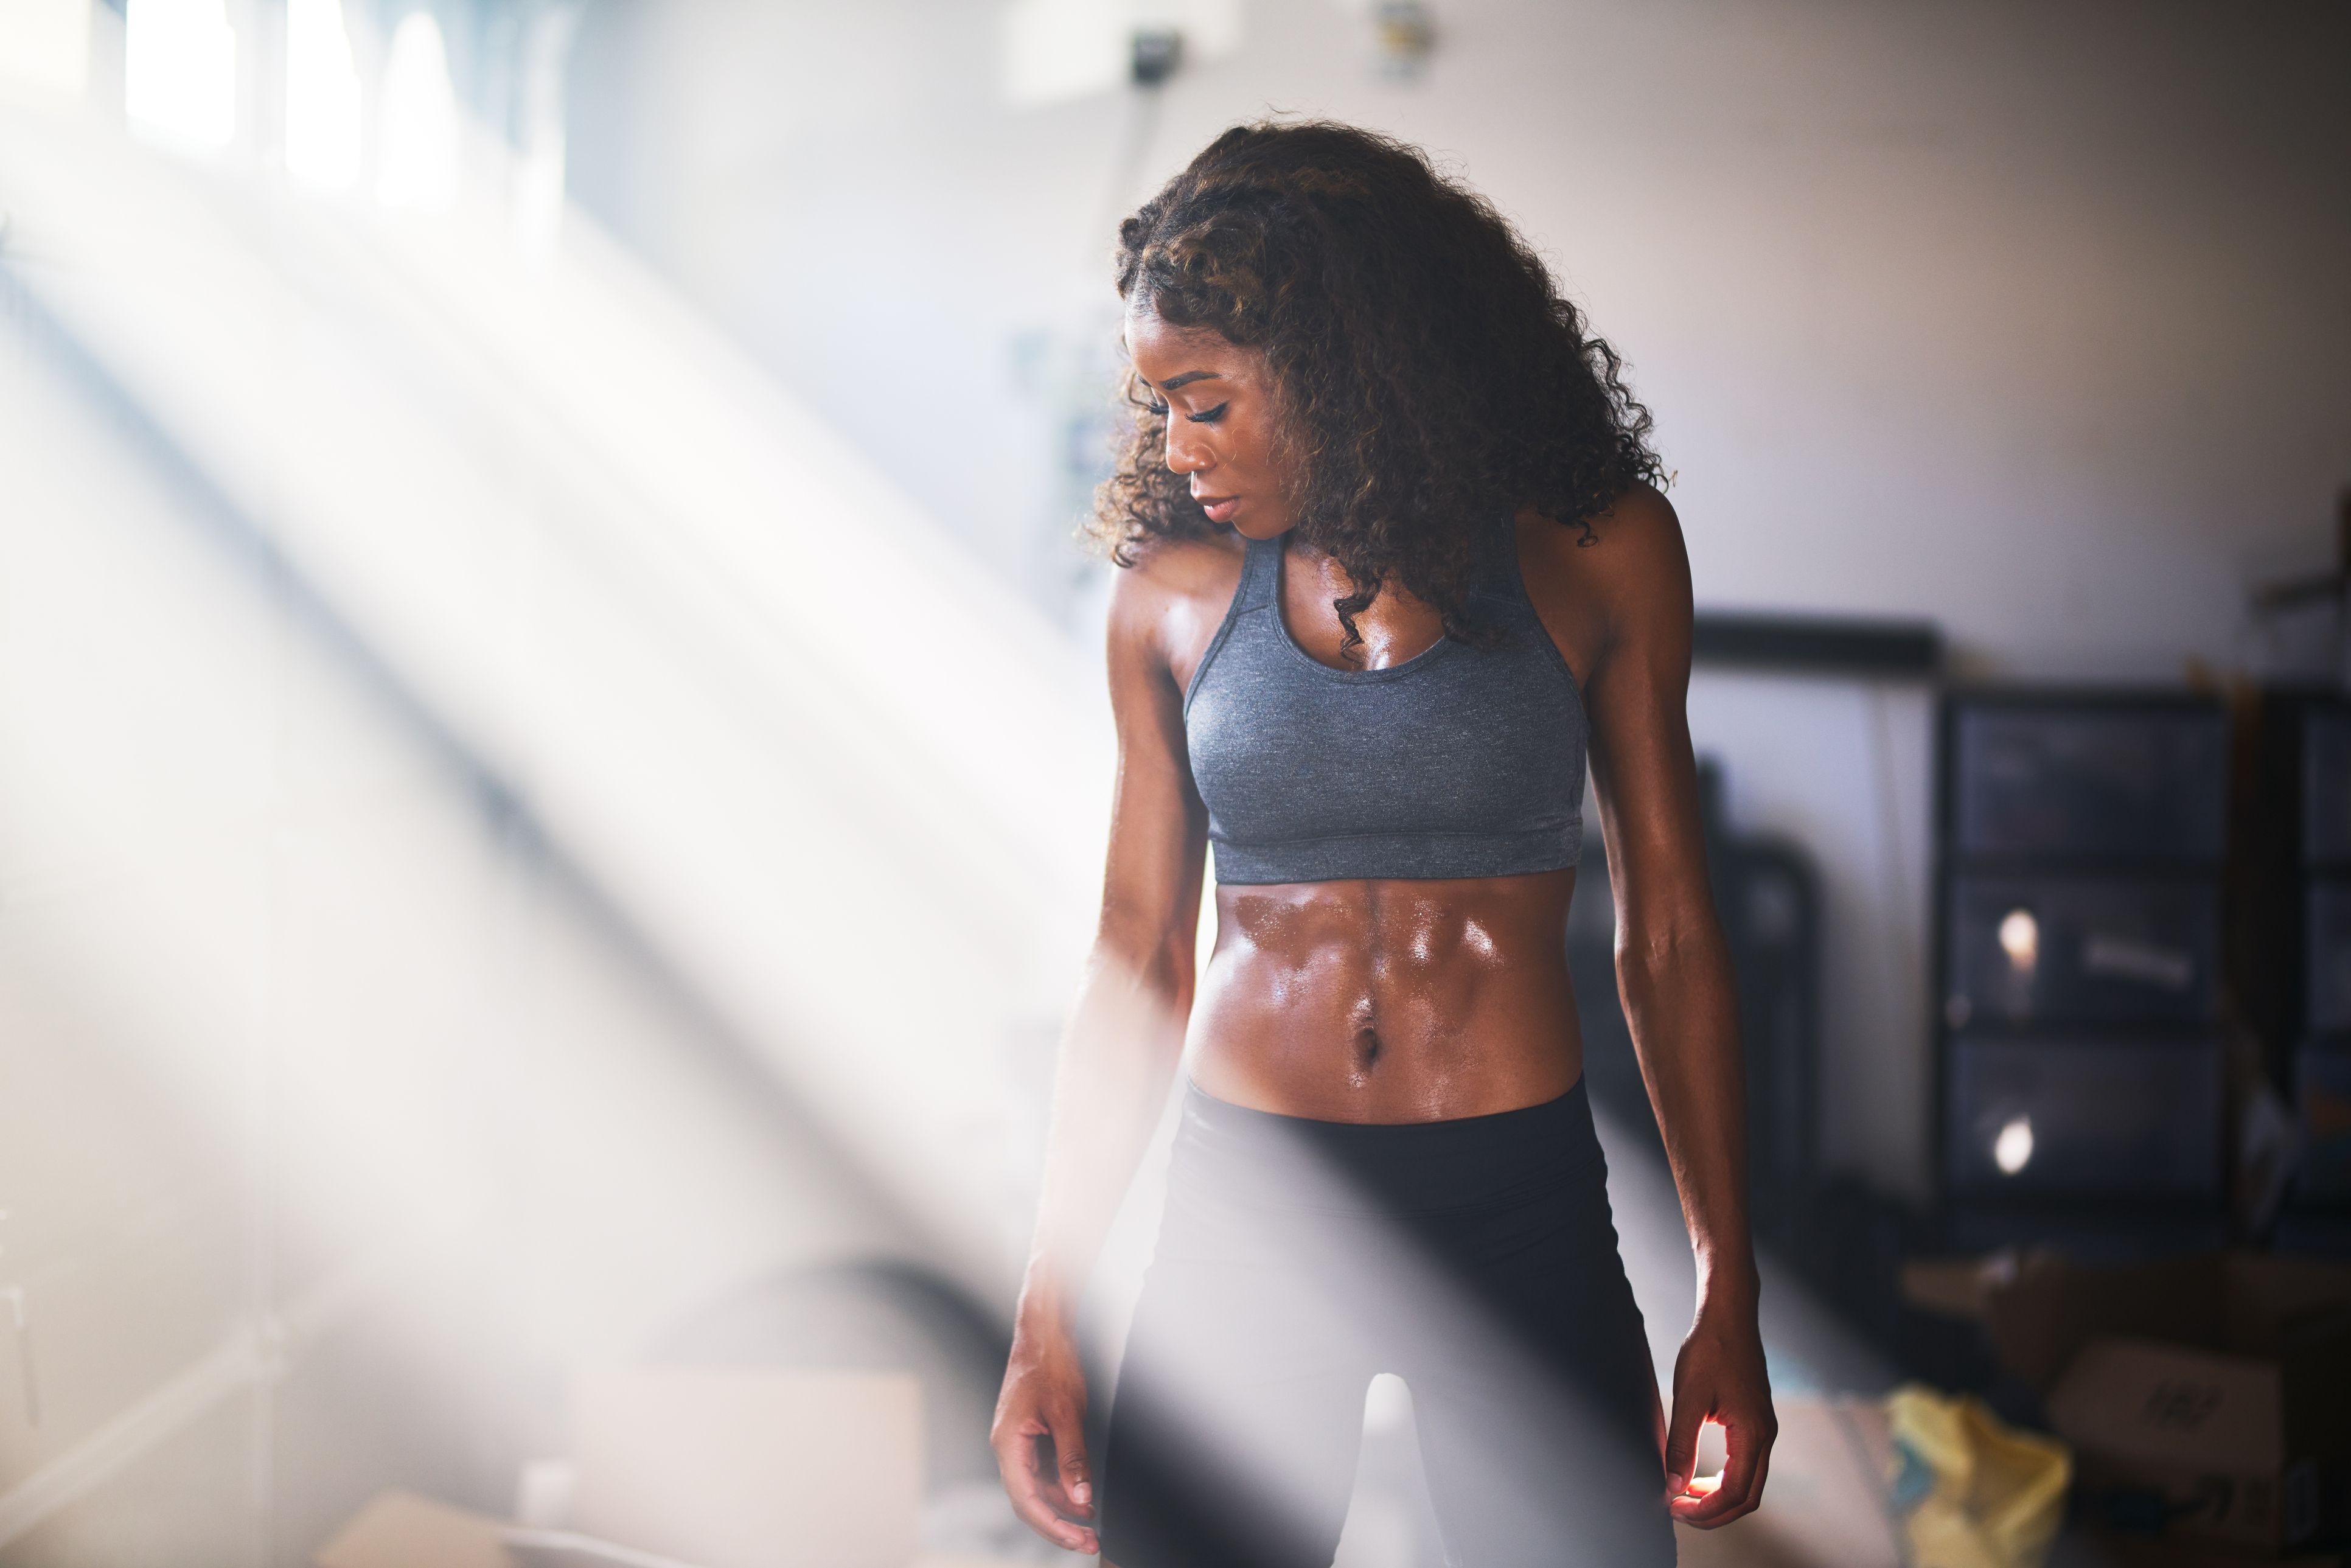 Is T25 an Effective Workout Program?